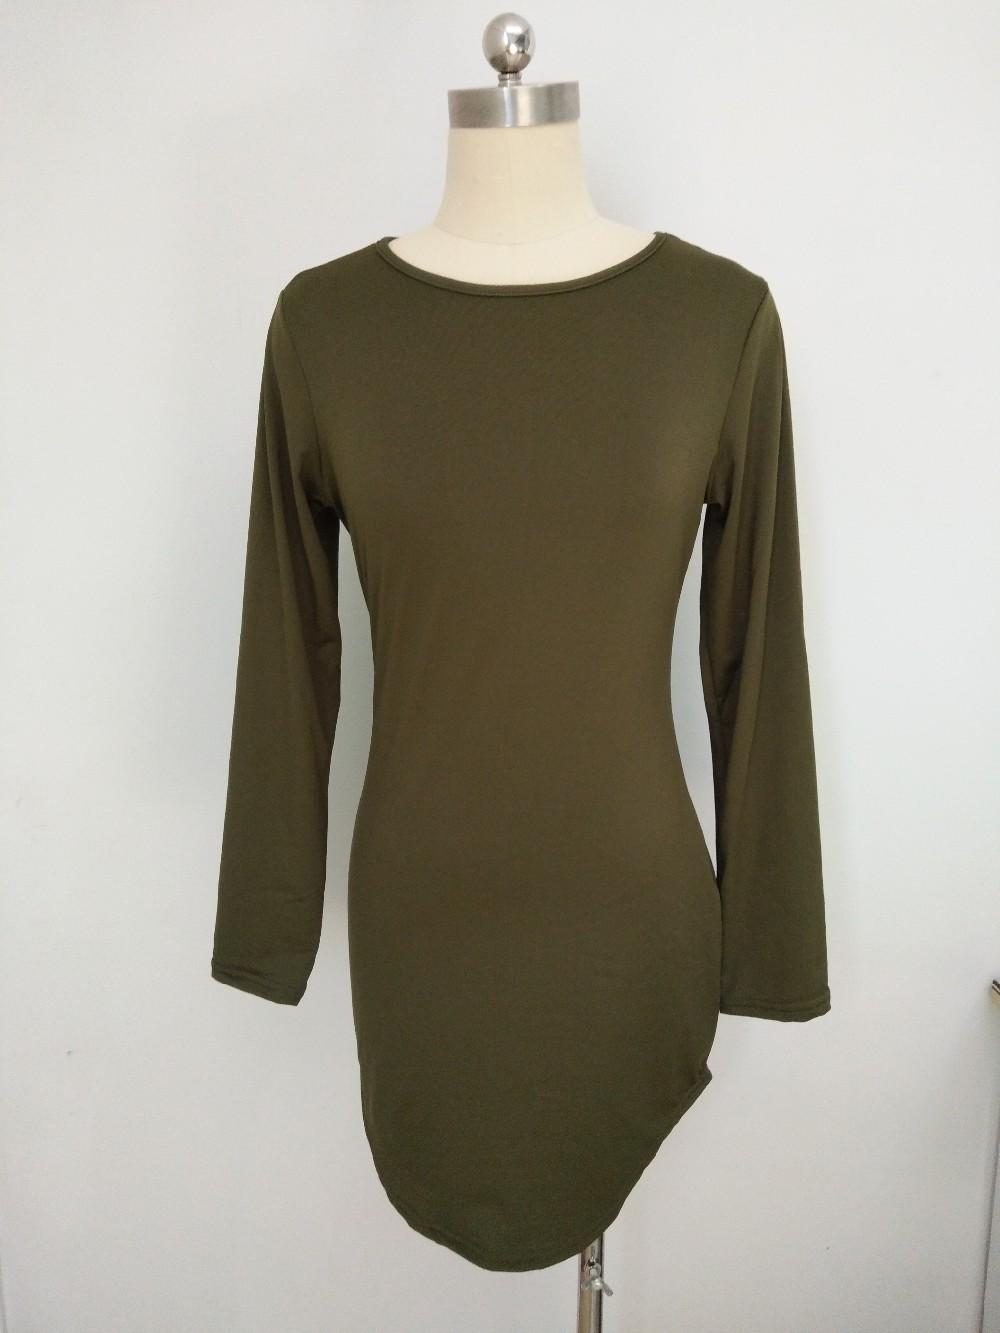 HTB1sFz9MVXXXXc0XXXXq6xXFXXX2 - Long Sleeve Mini Bodycon Split Tshirt Bandage Dresses JKP208